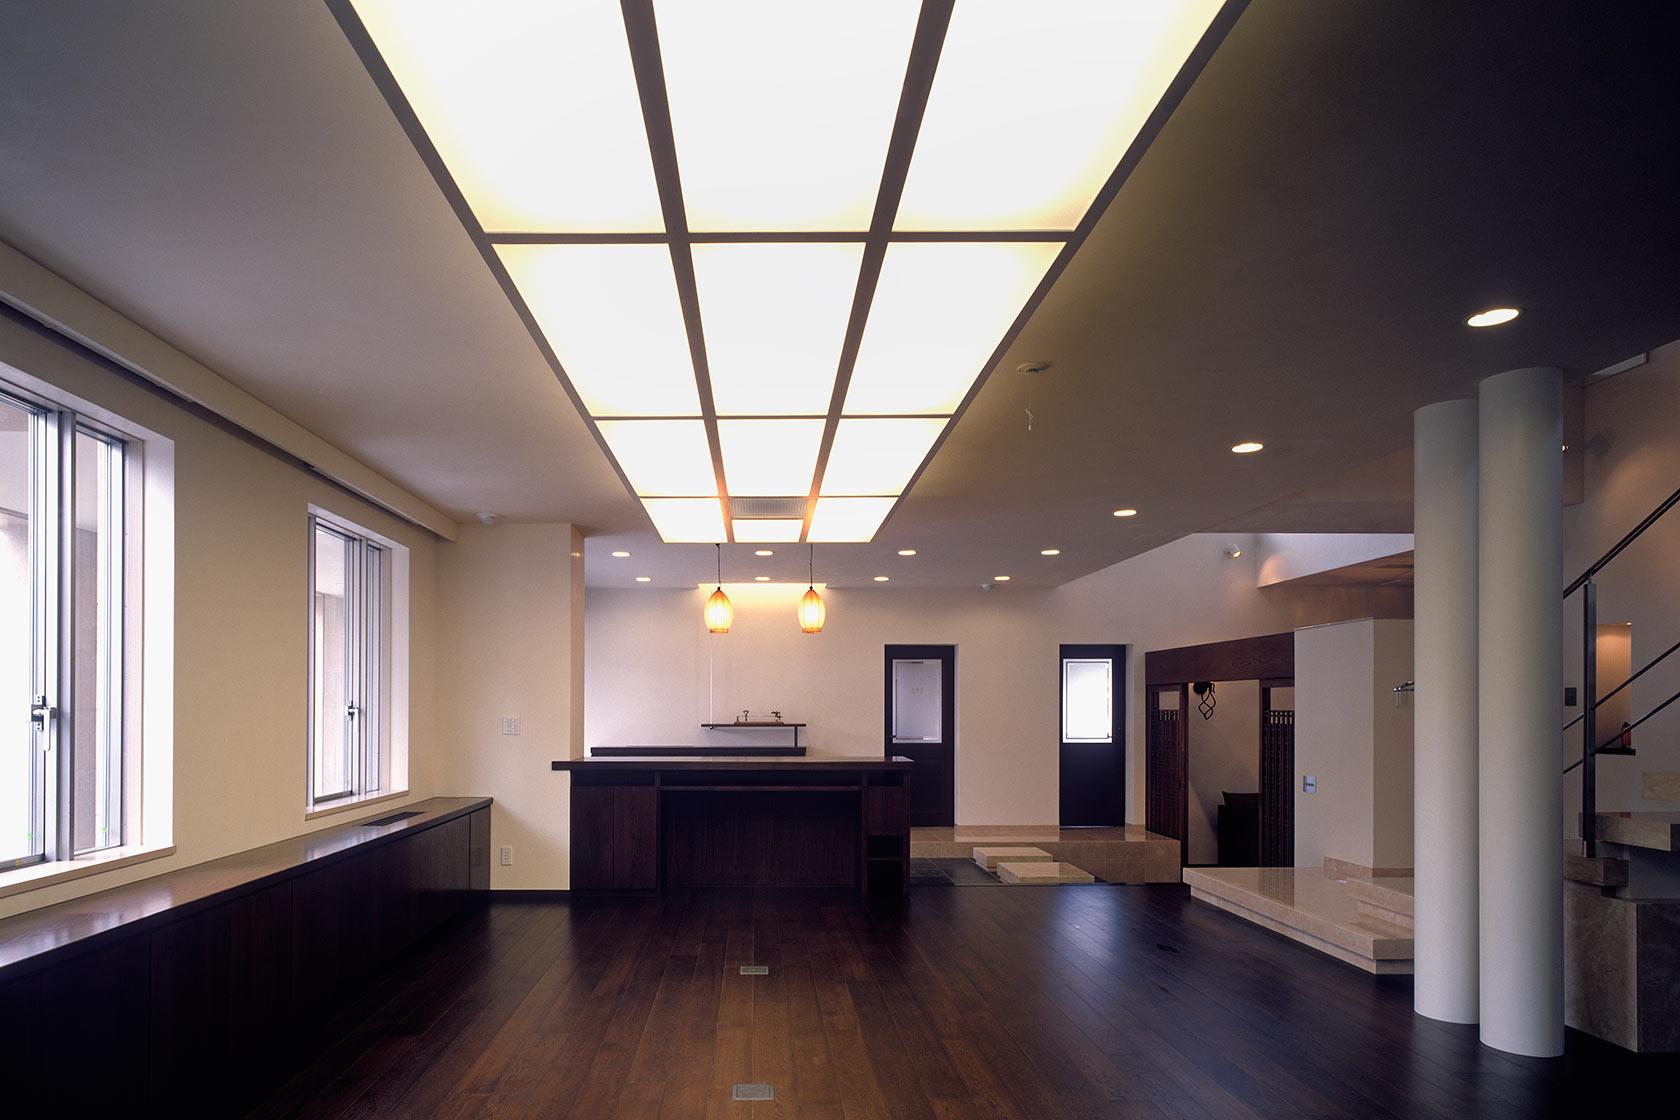 K織物株式会社+K邸19-事務室からエントランスを見る